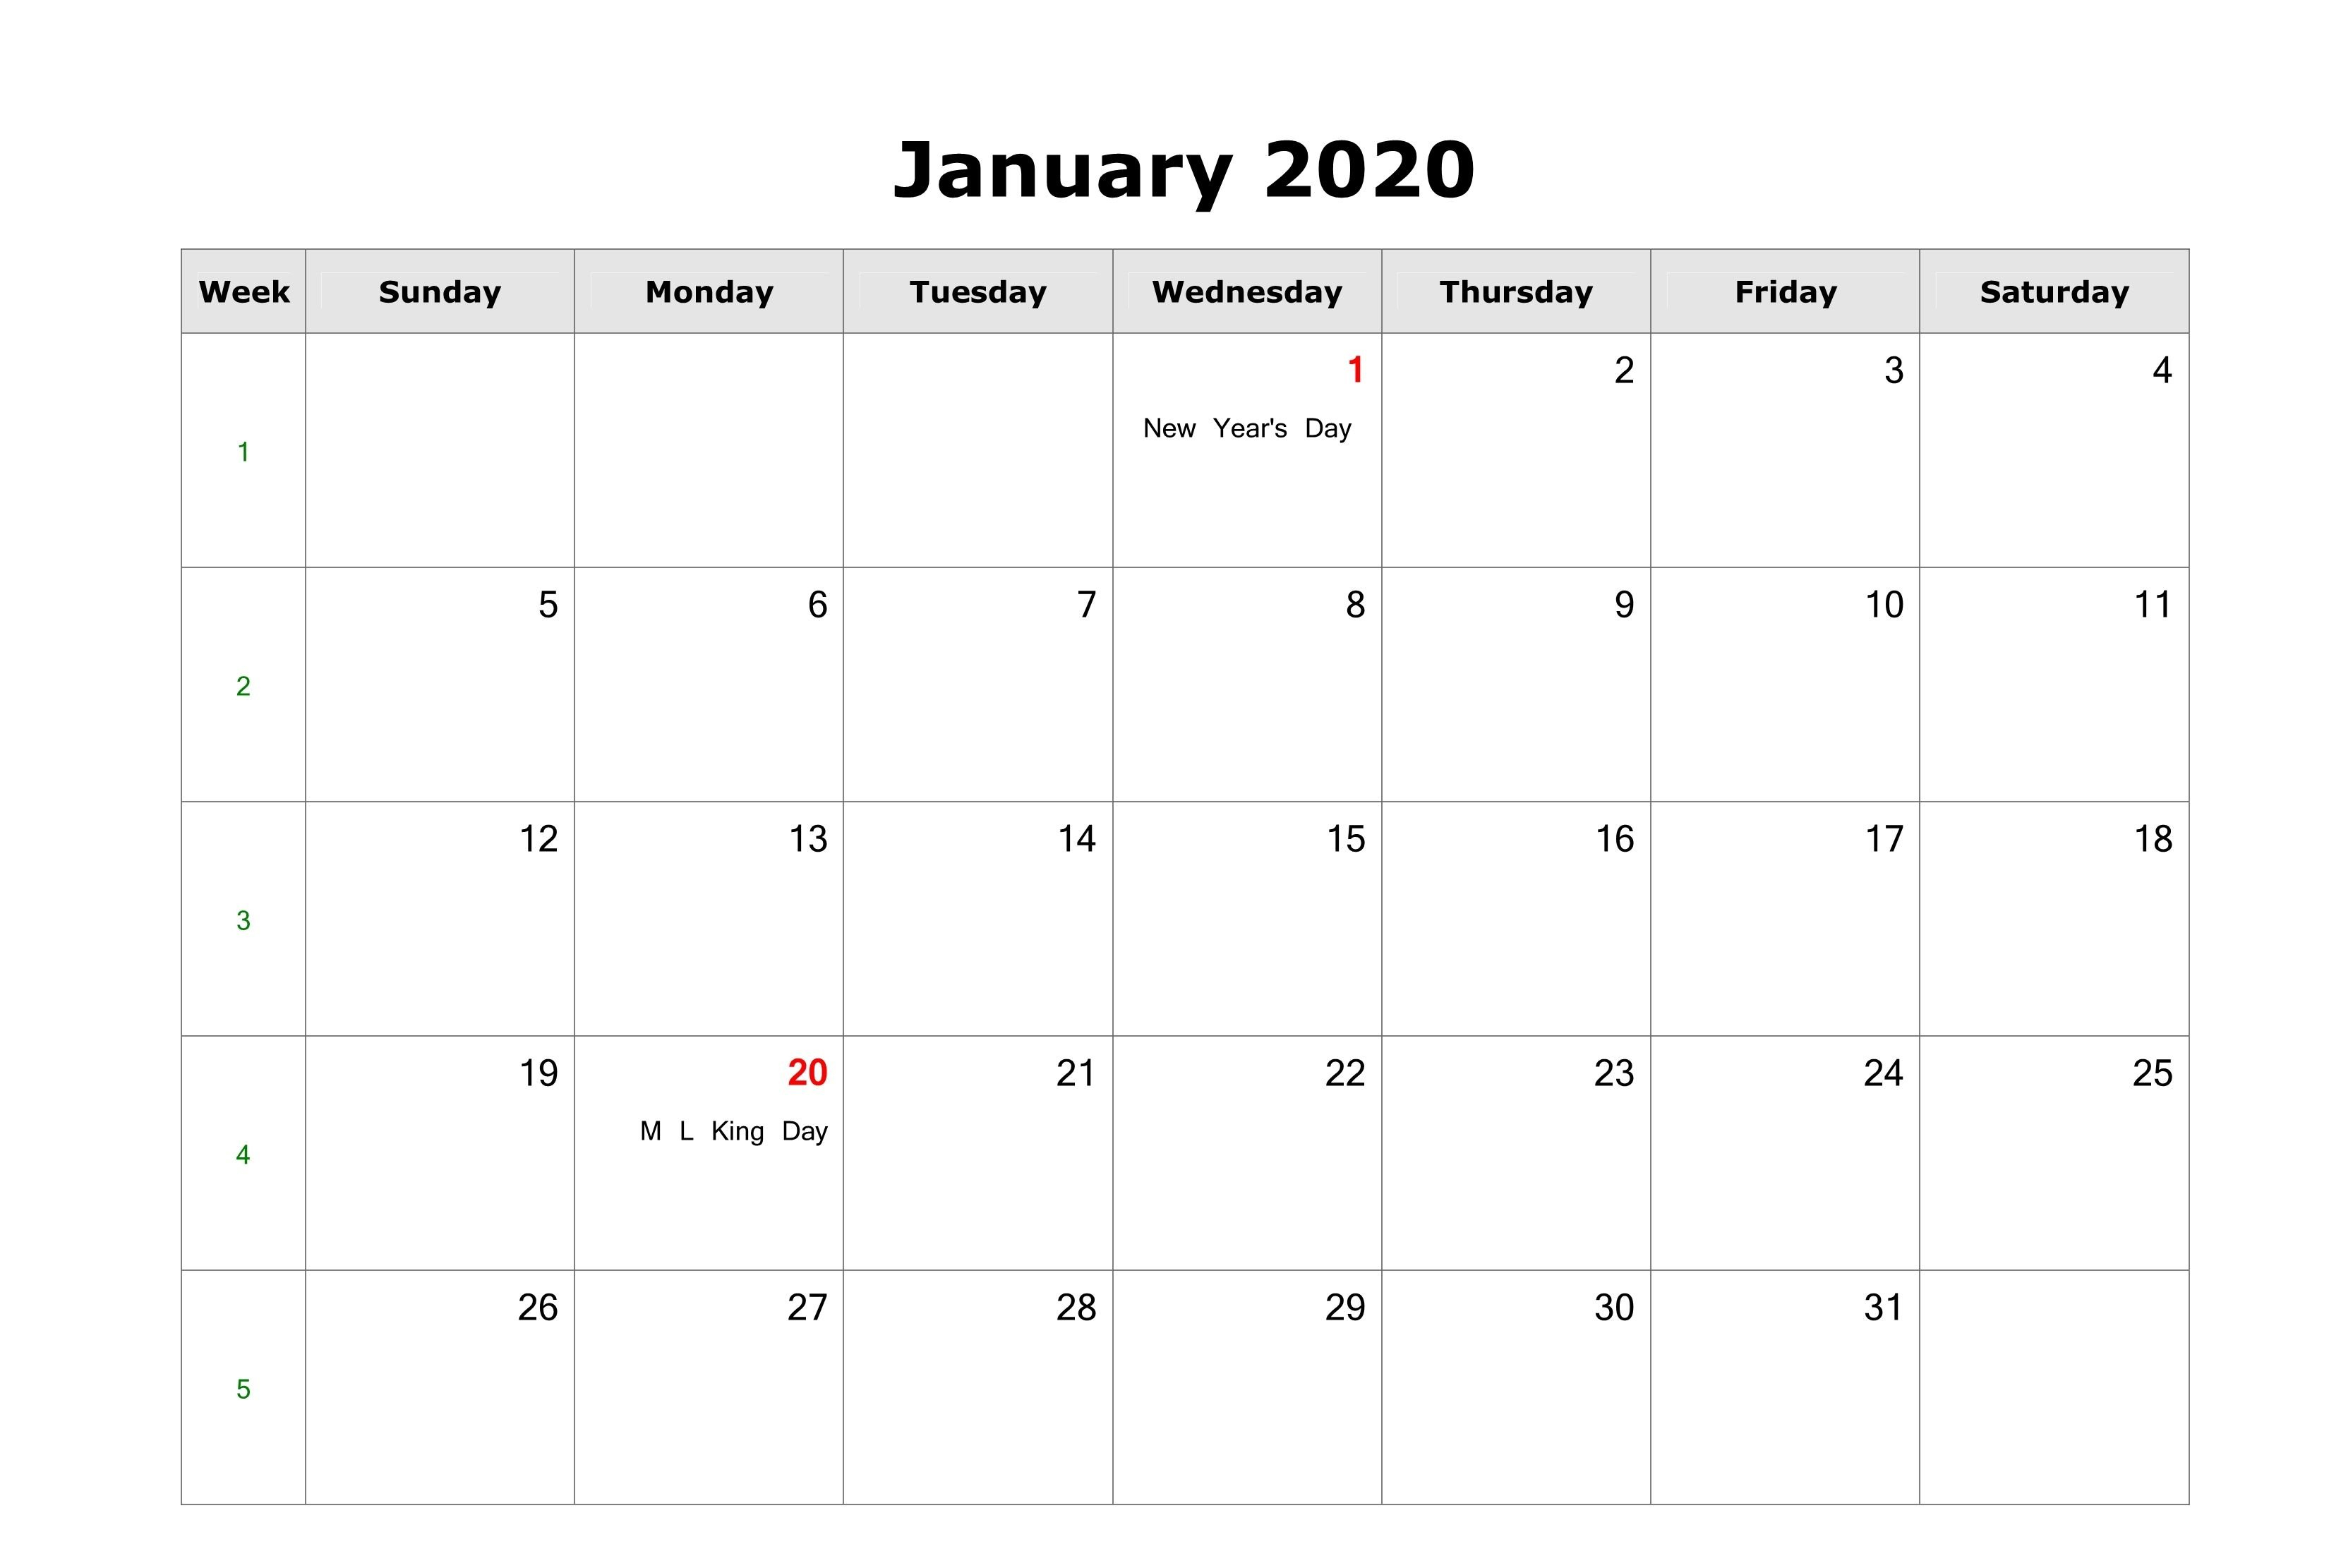 Free Fillable January Calendar 2020 Printable Editable With Blank Calendar I Can Edit And Print